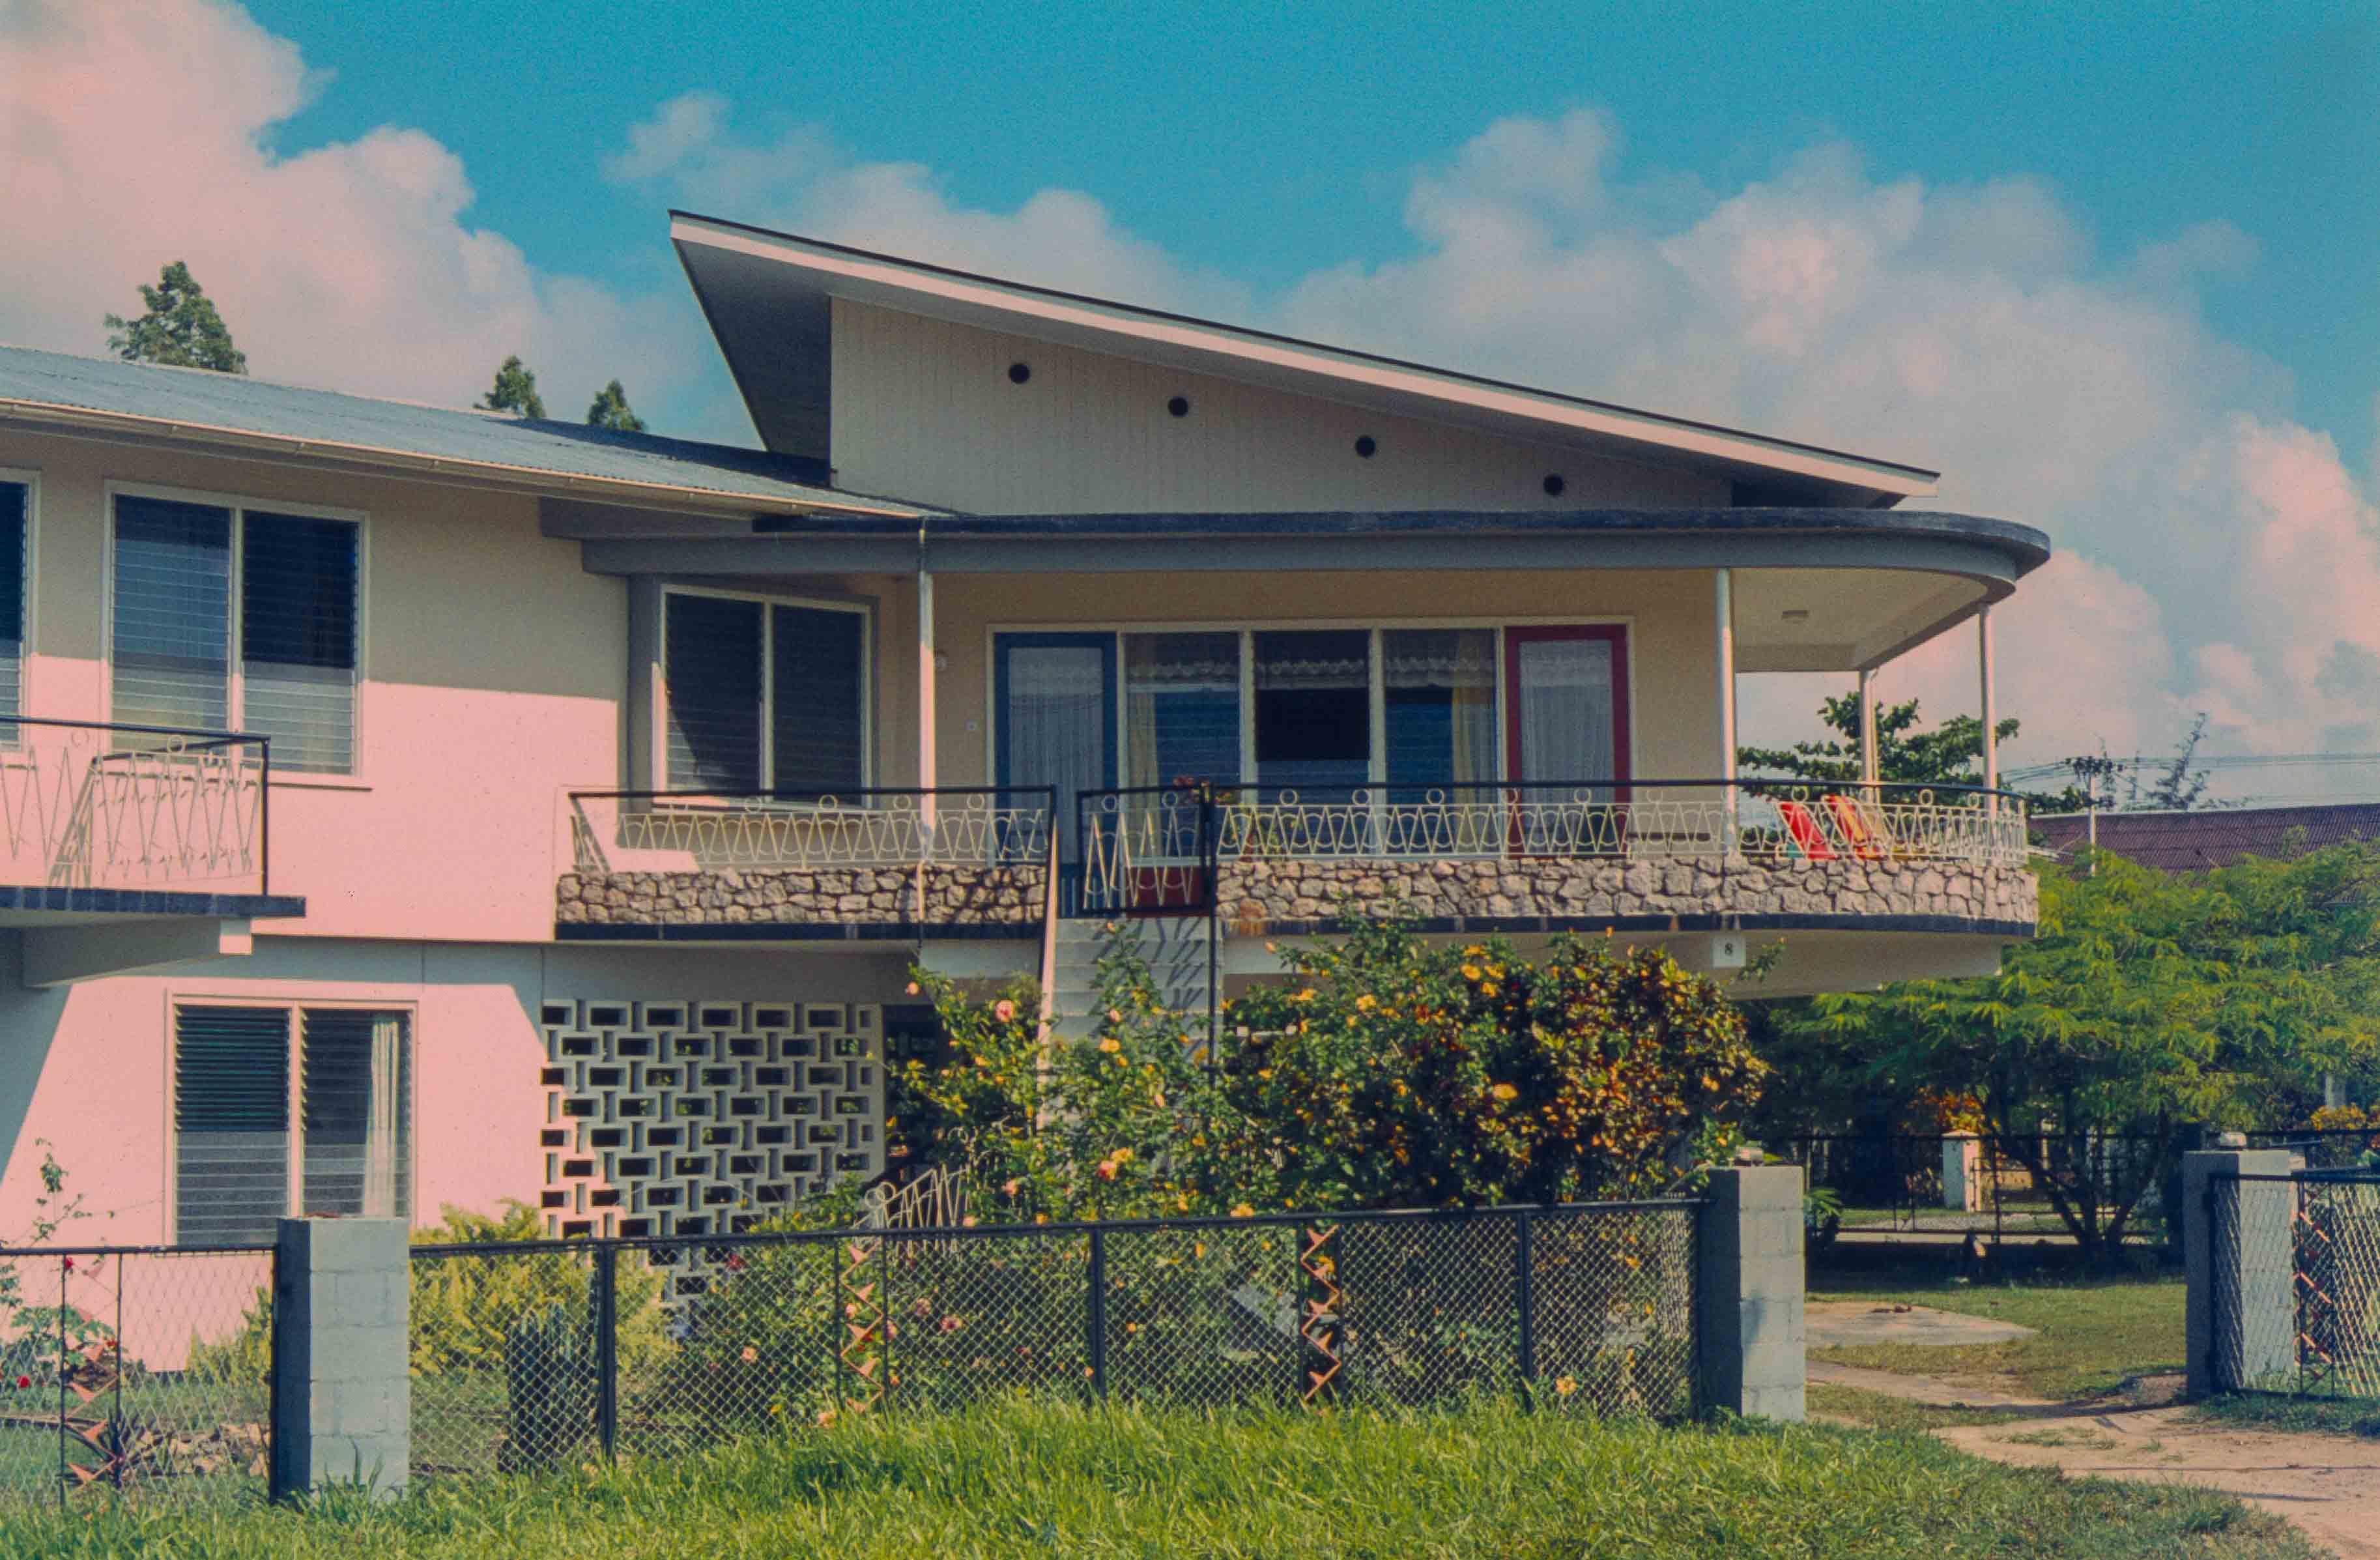 208. Suriname